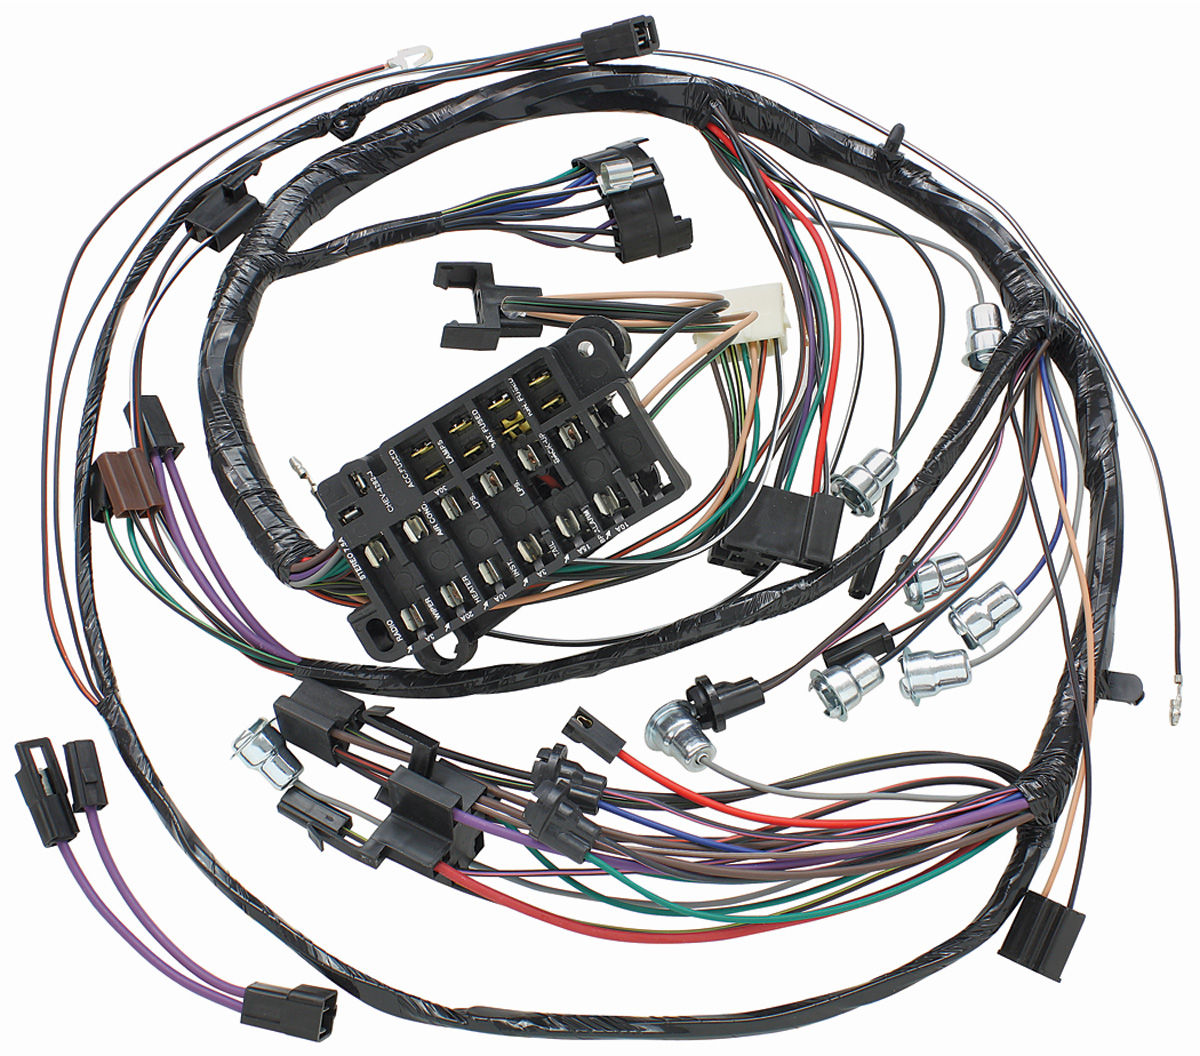 medium resolution of 67 chevelle dash fuse box wiring library dodge charger fuse box 67 chevelle dash fuse box